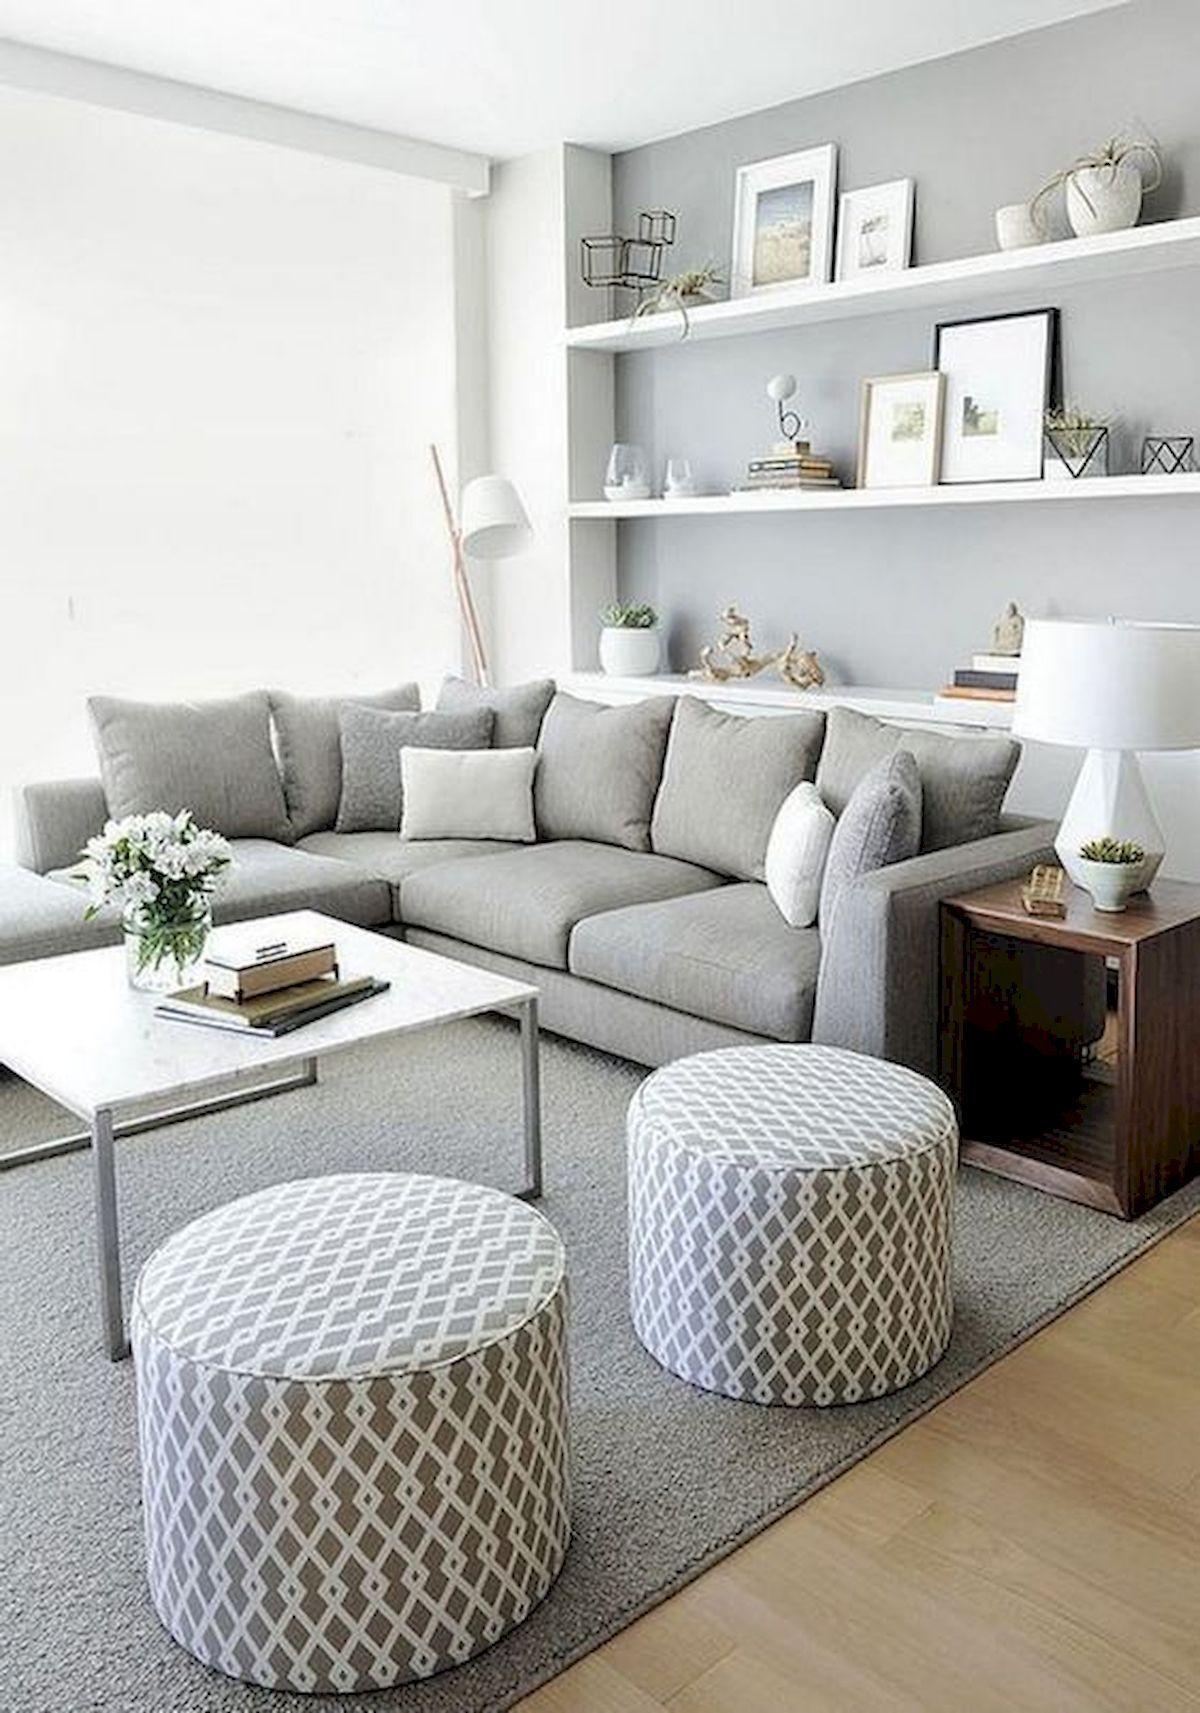 Photo of 57 Cozy Living Room Apartment Decor Ideas